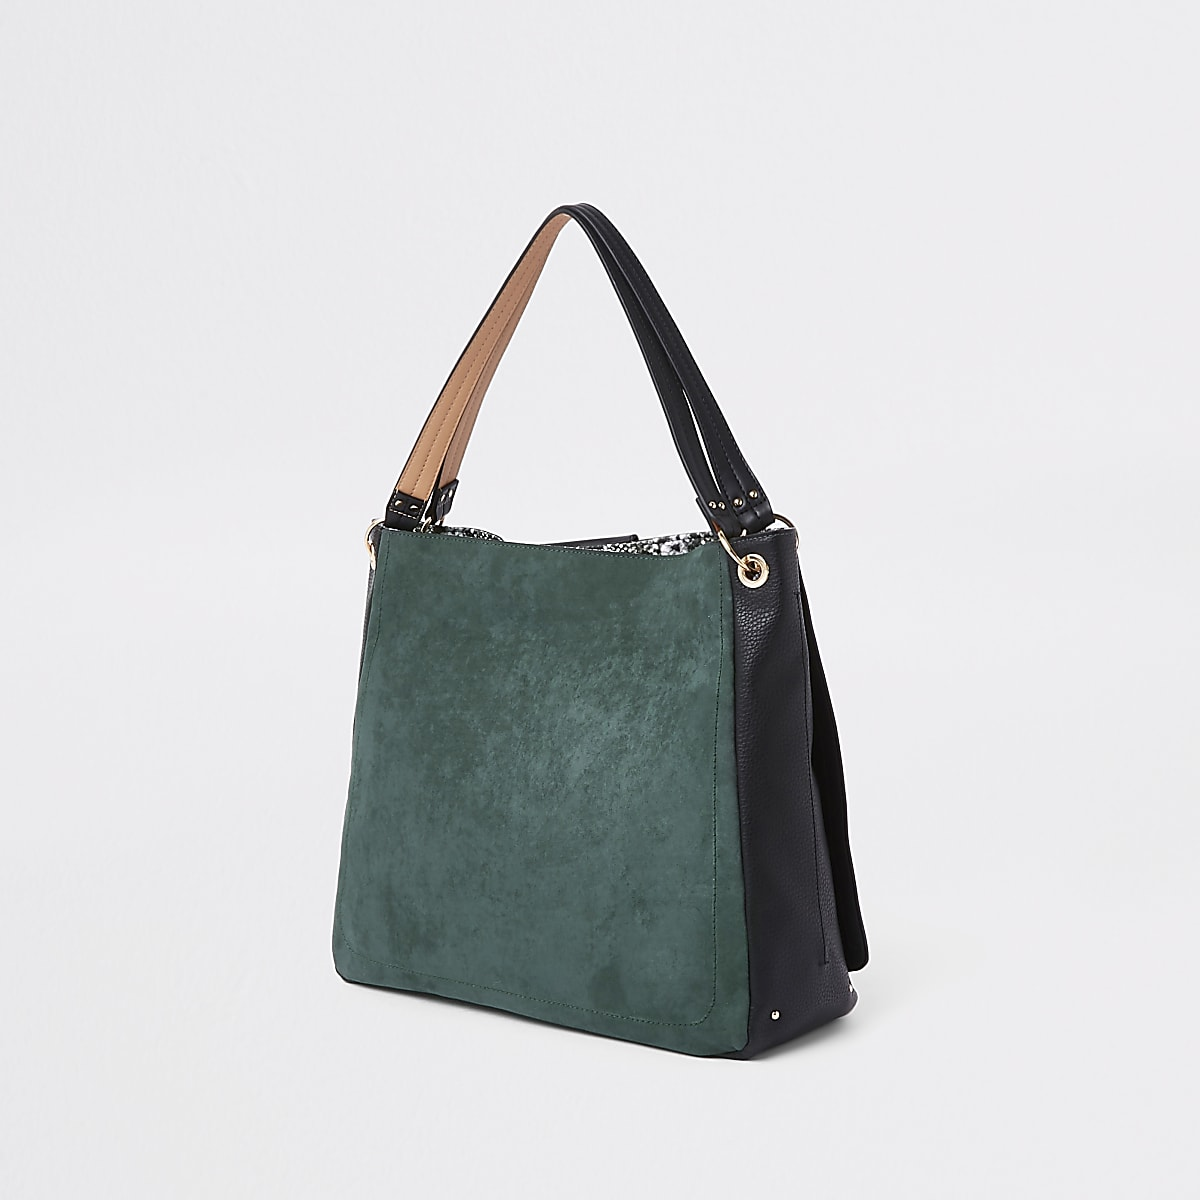 ae21618b3 Dark green oversized metal ring slouch bag - Shoulder Bags - Bags ...